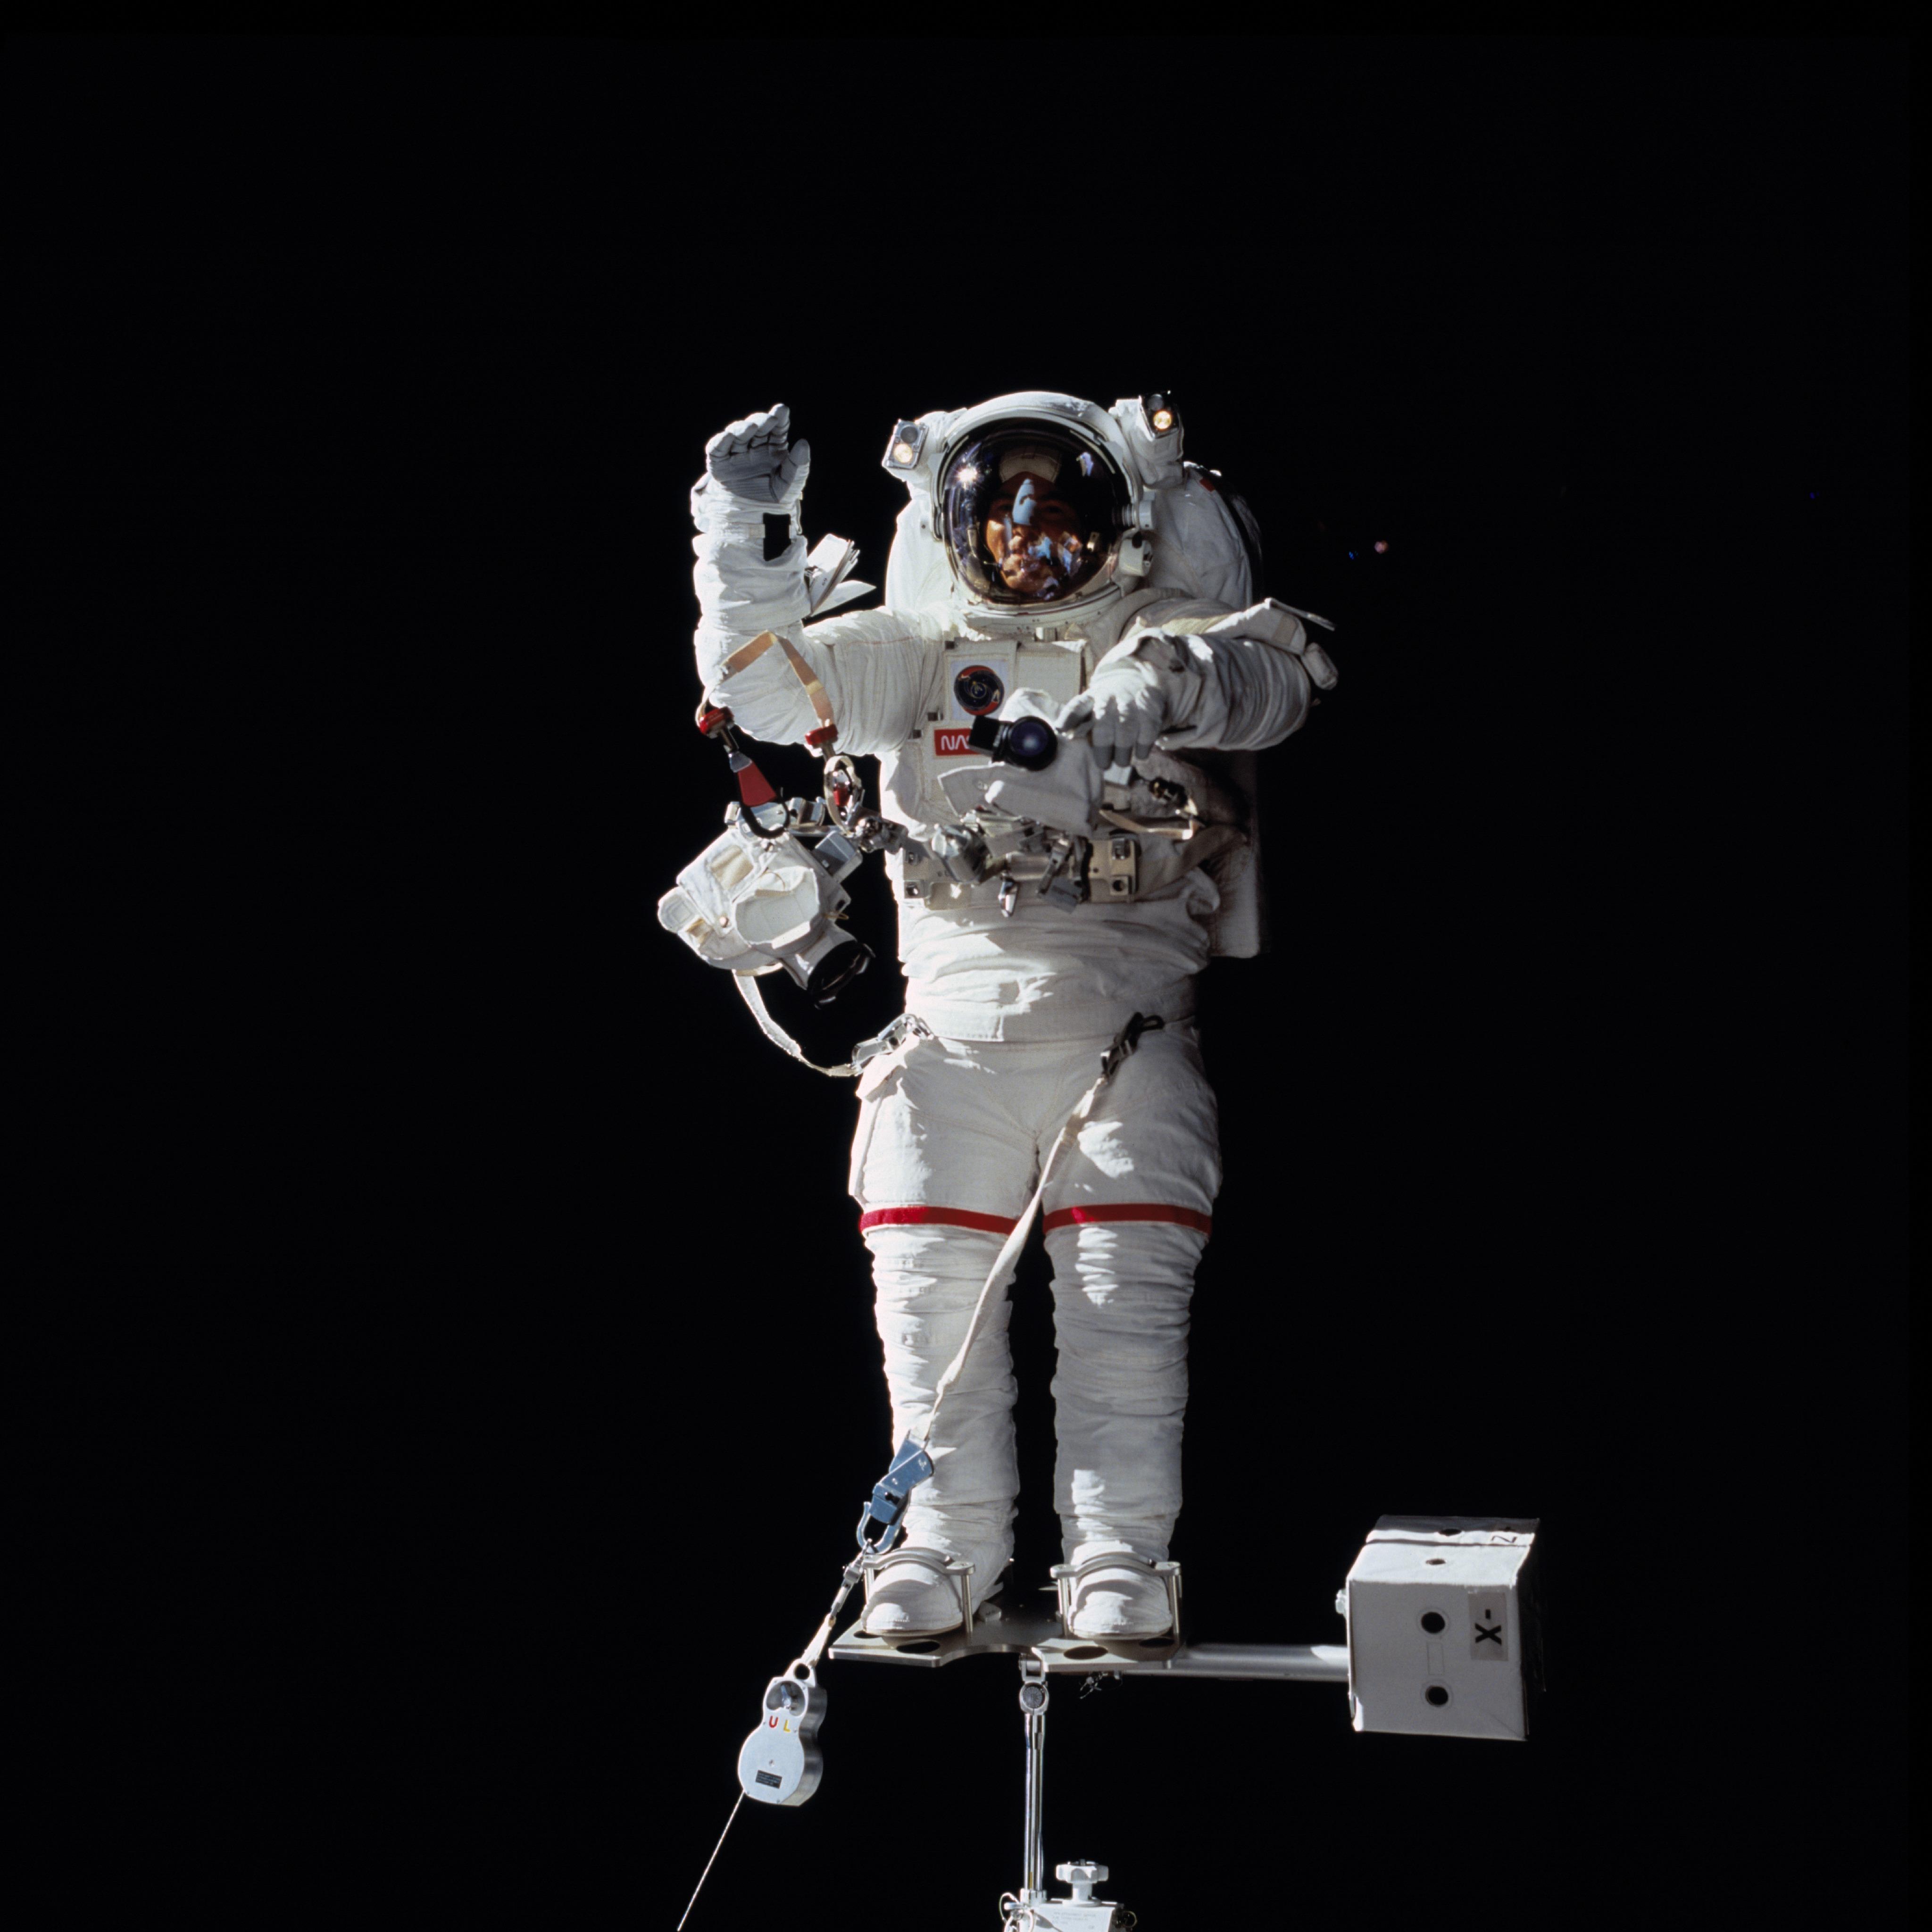 top astronaut gallery attractions spacecenterorg - HD4096×4096